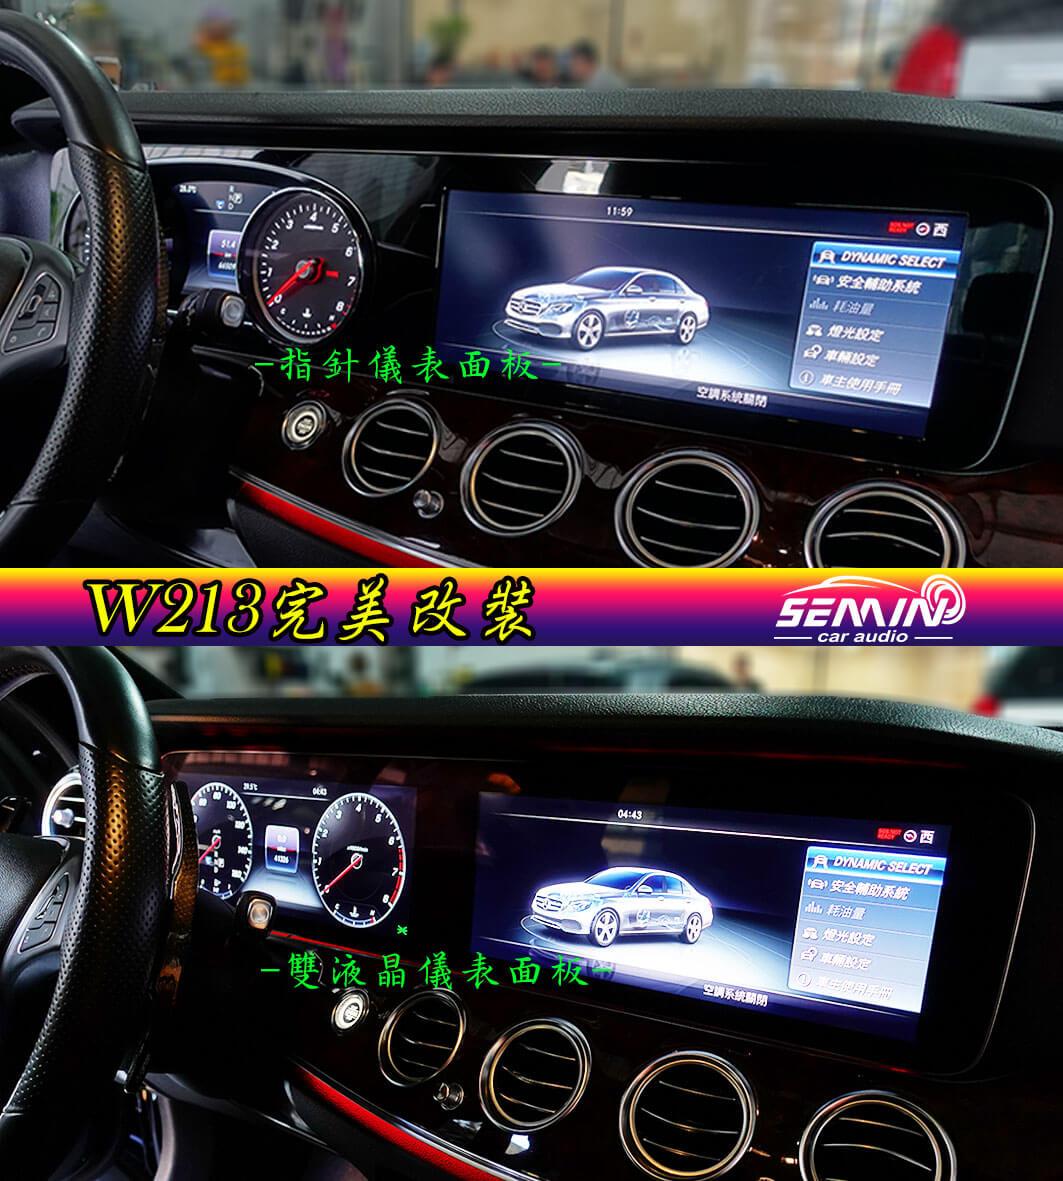 BENZ E300 W213 改裝原廠雙液晶大螢幕